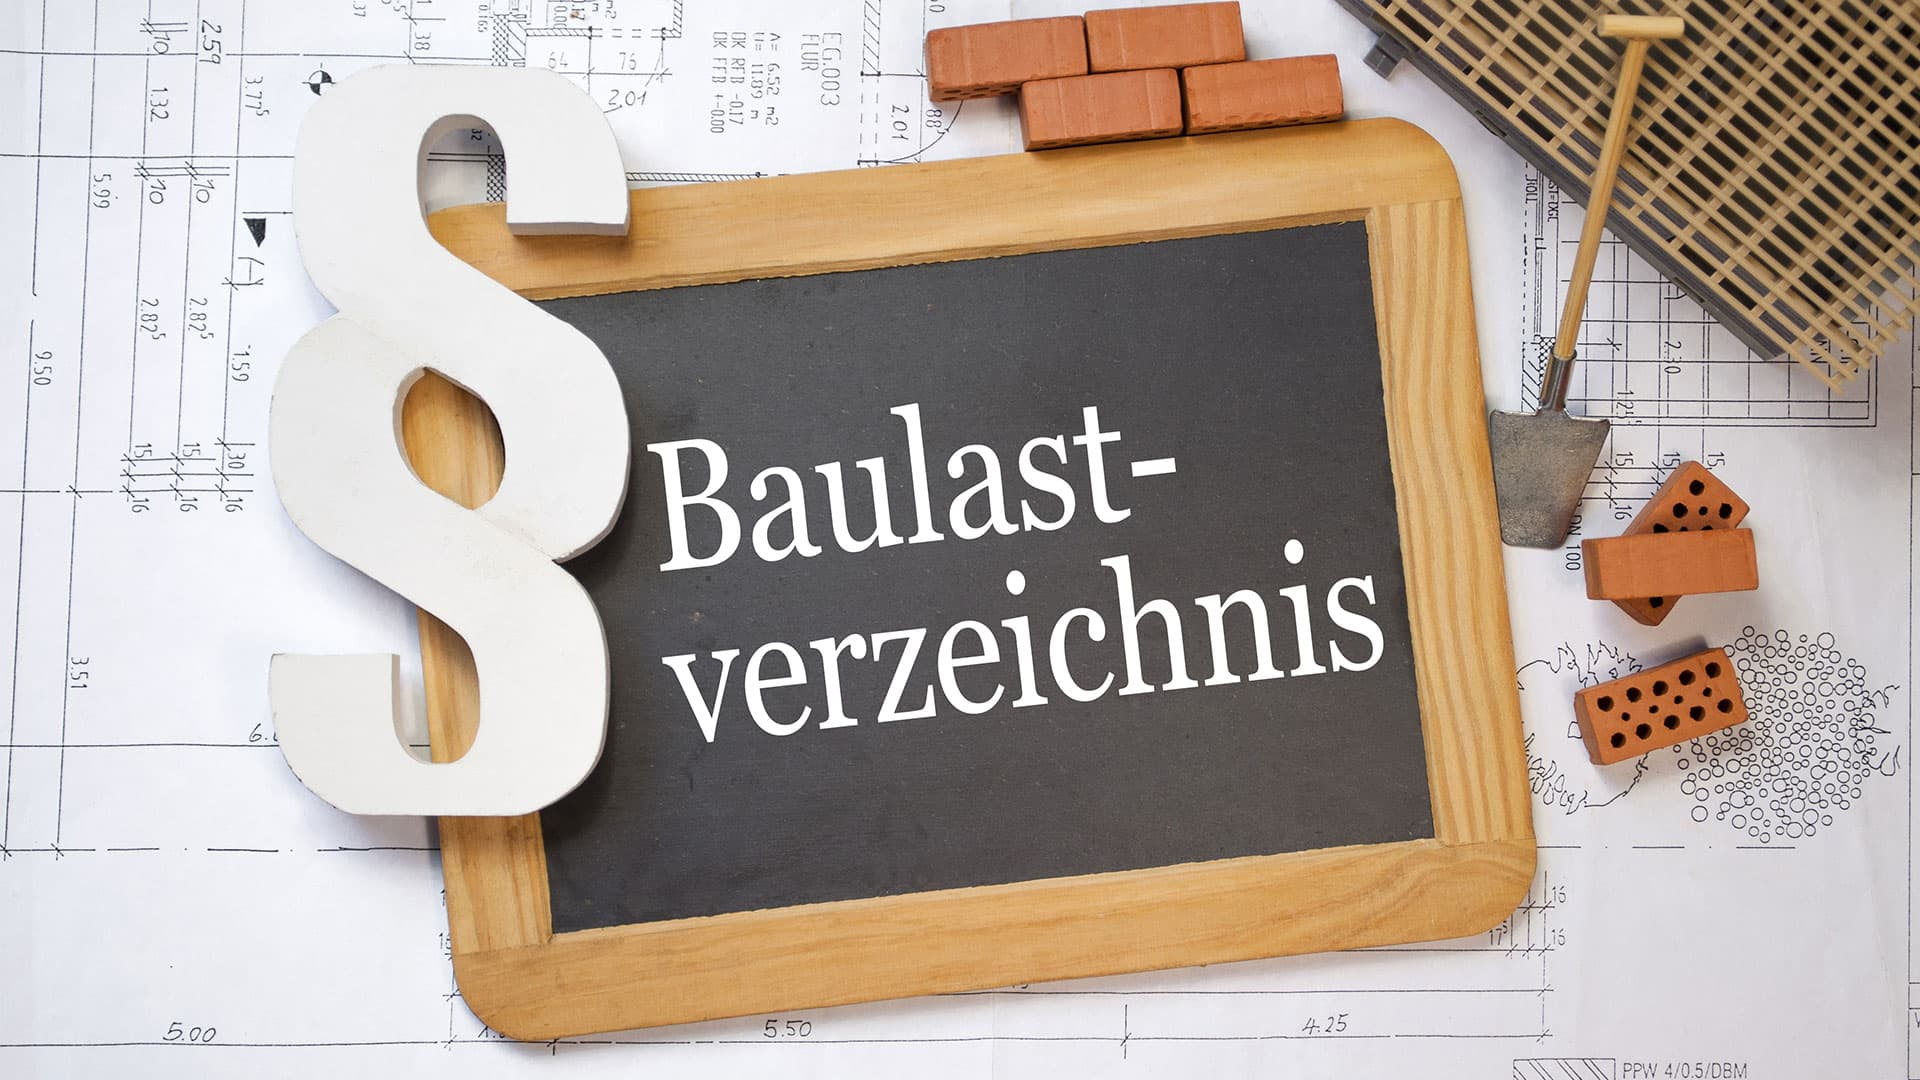 Baulast